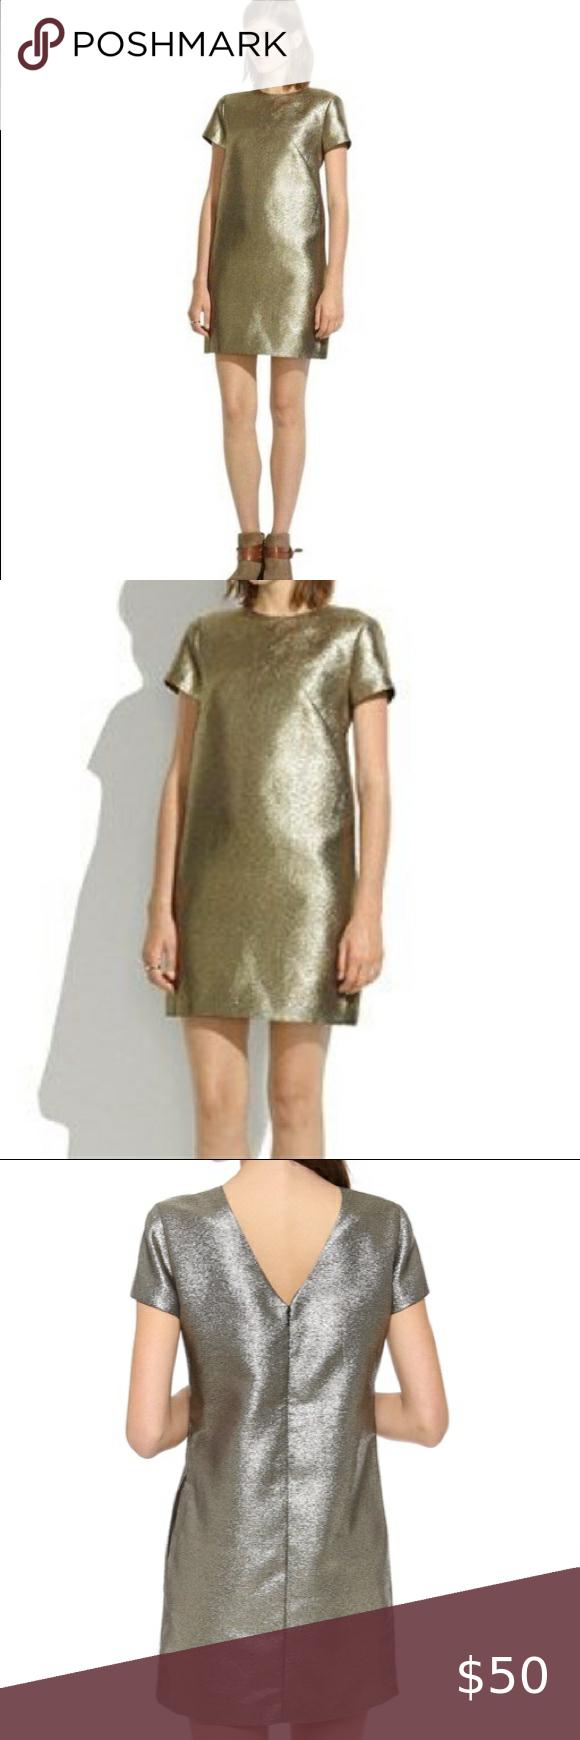 Madewell Metallic Gold Shift Dress Shift Dress Clothes Design Fashion [ 1740 x 580 Pixel ]